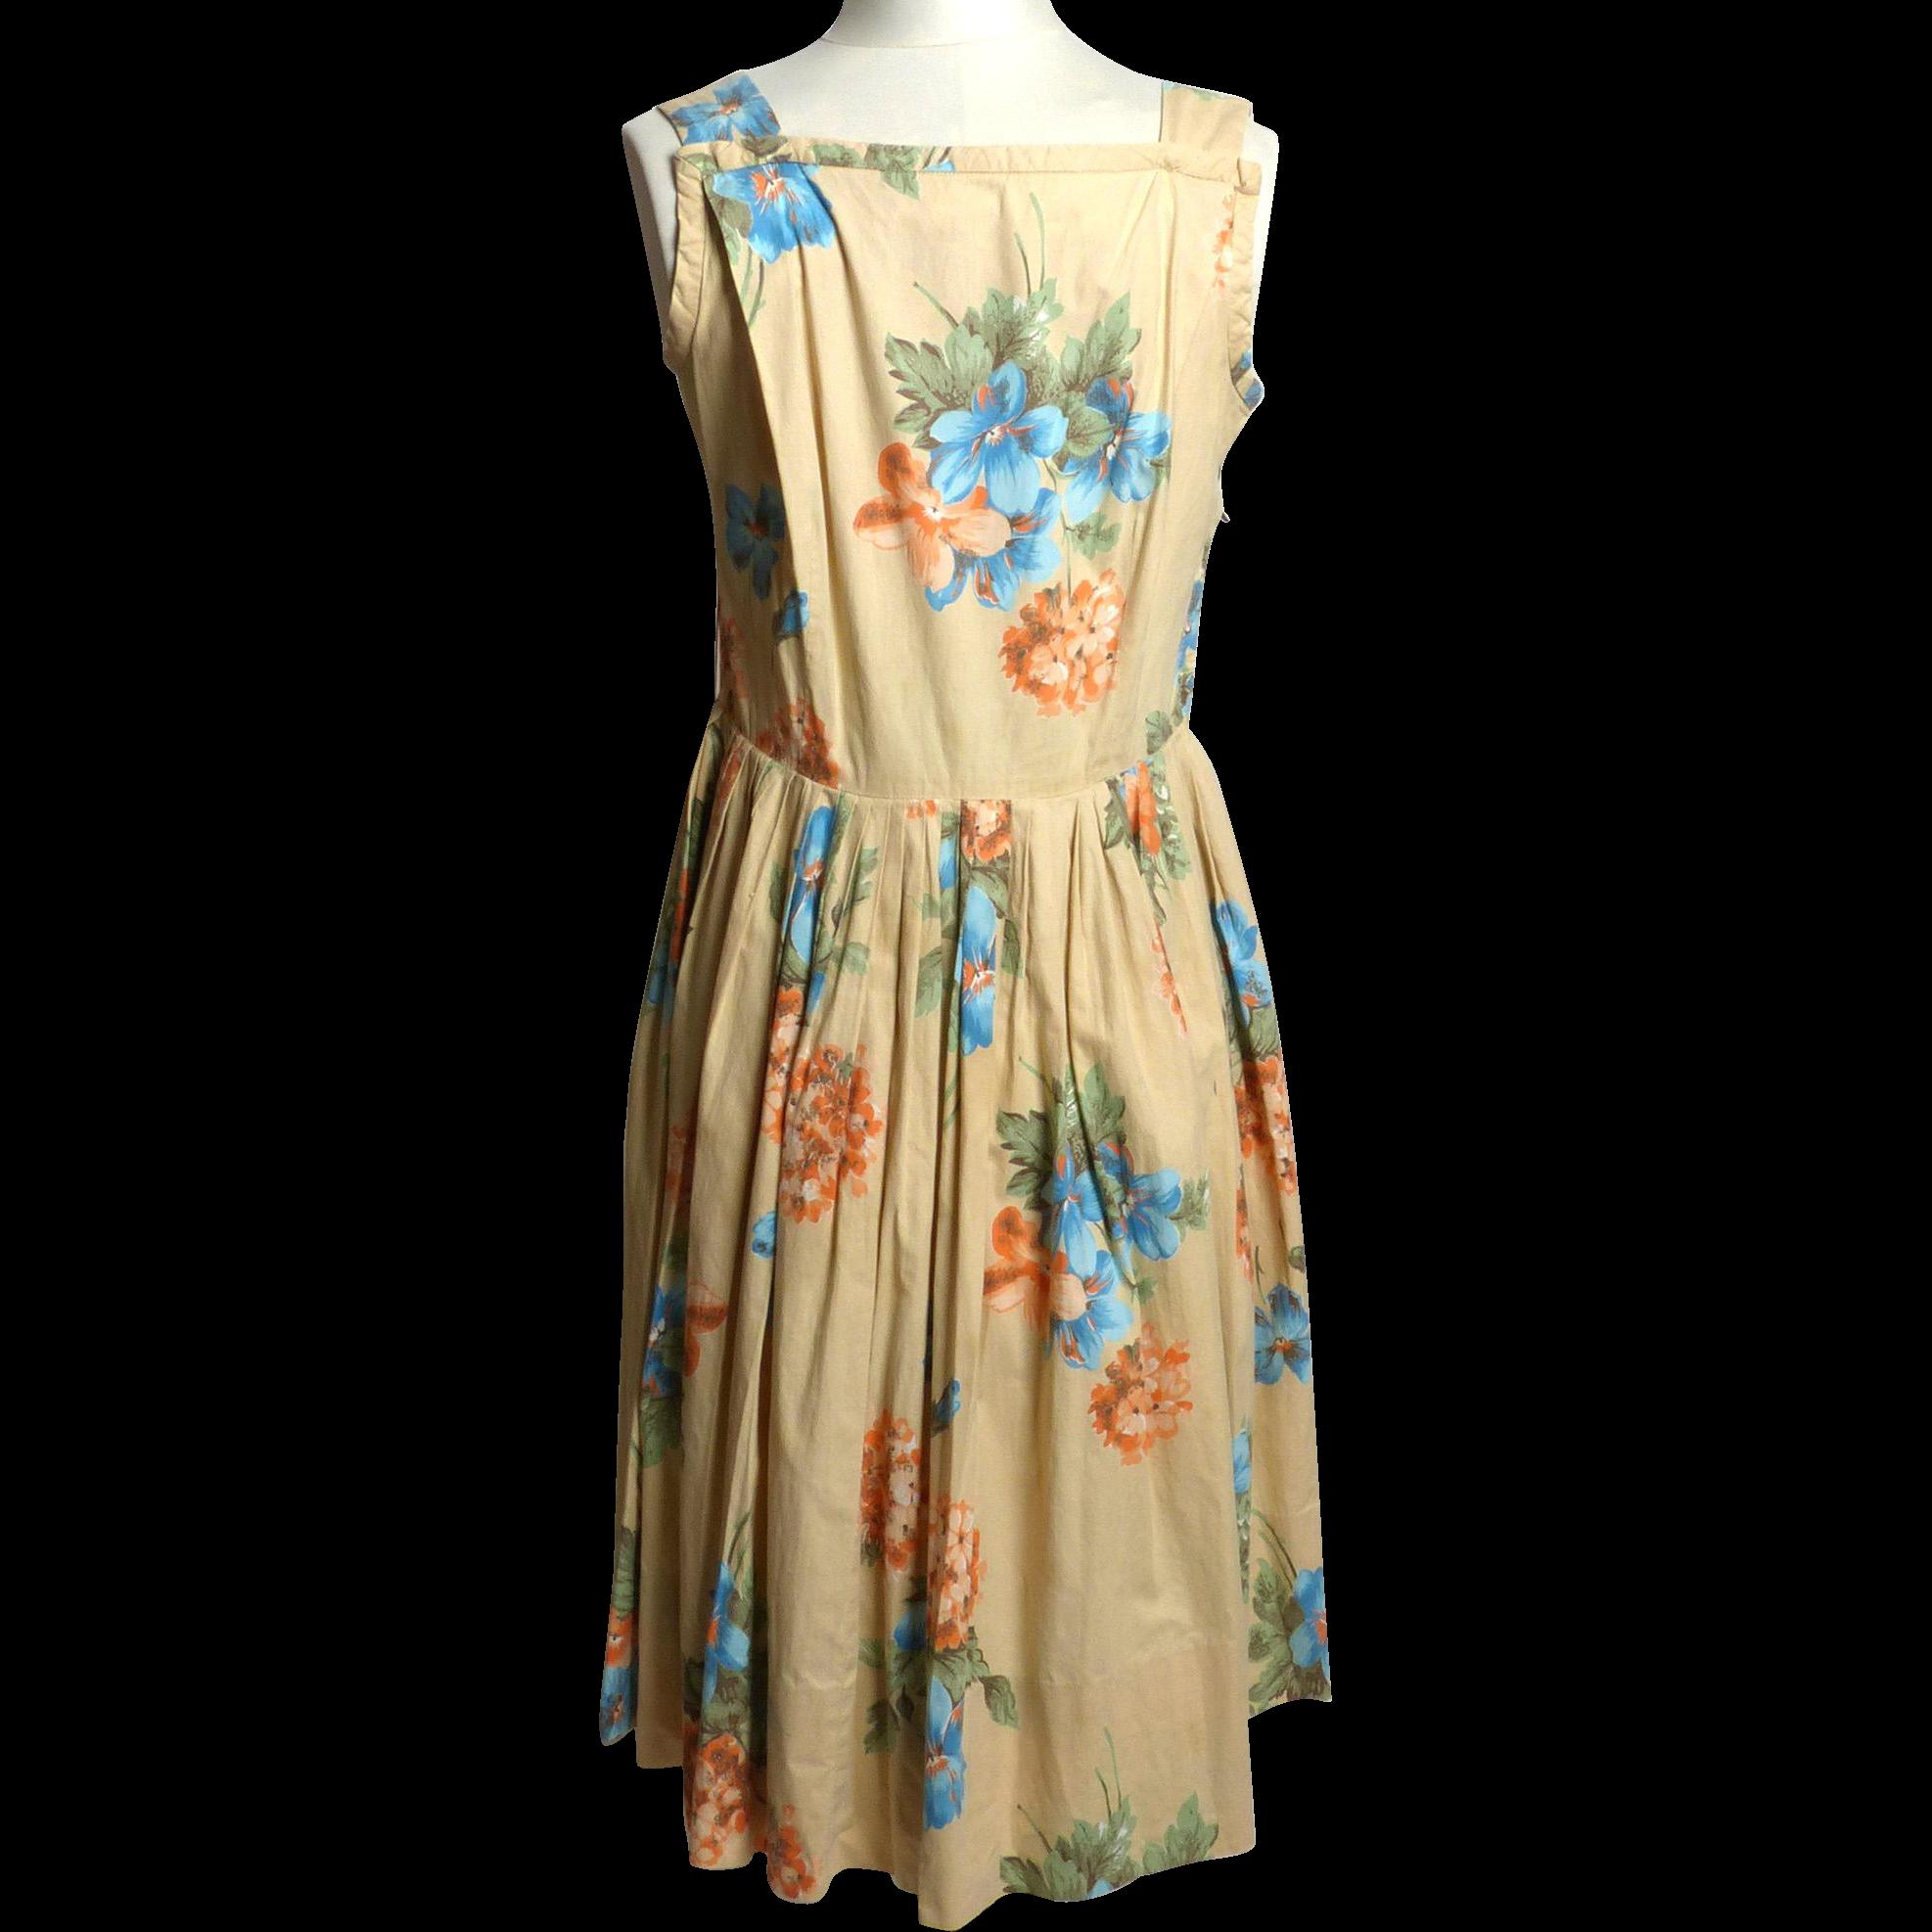 Circa 1950s Beige Floral Sundress